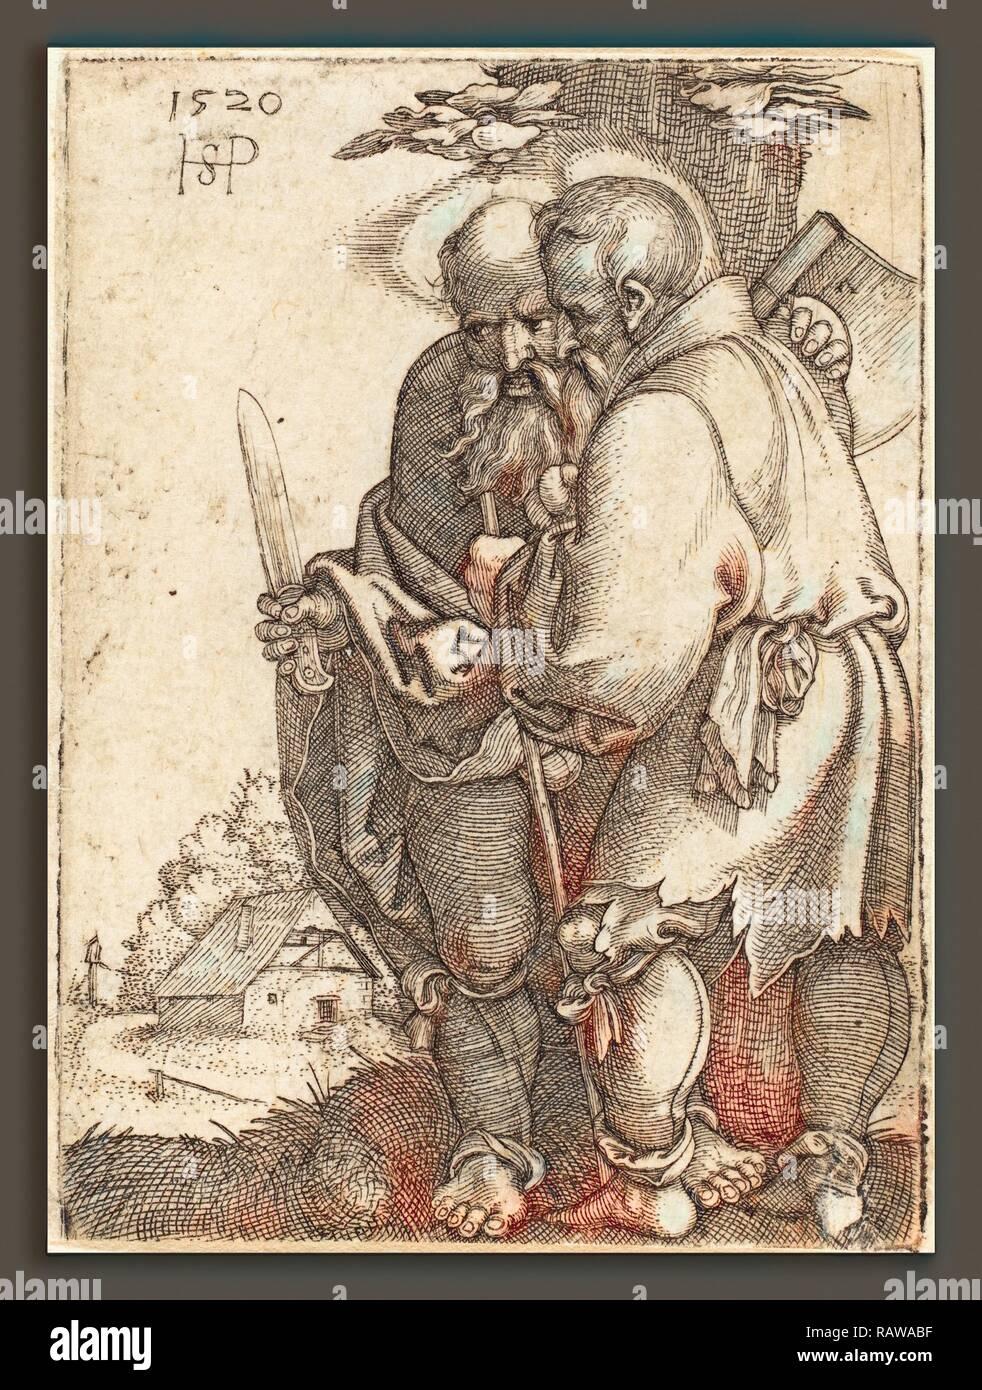 Sebald Beham (German, 1500 - 1550), Bartholomew and Matthias, 1520, engraving. Reimagined by Gibon. Classic art with reimagined - Stock Image